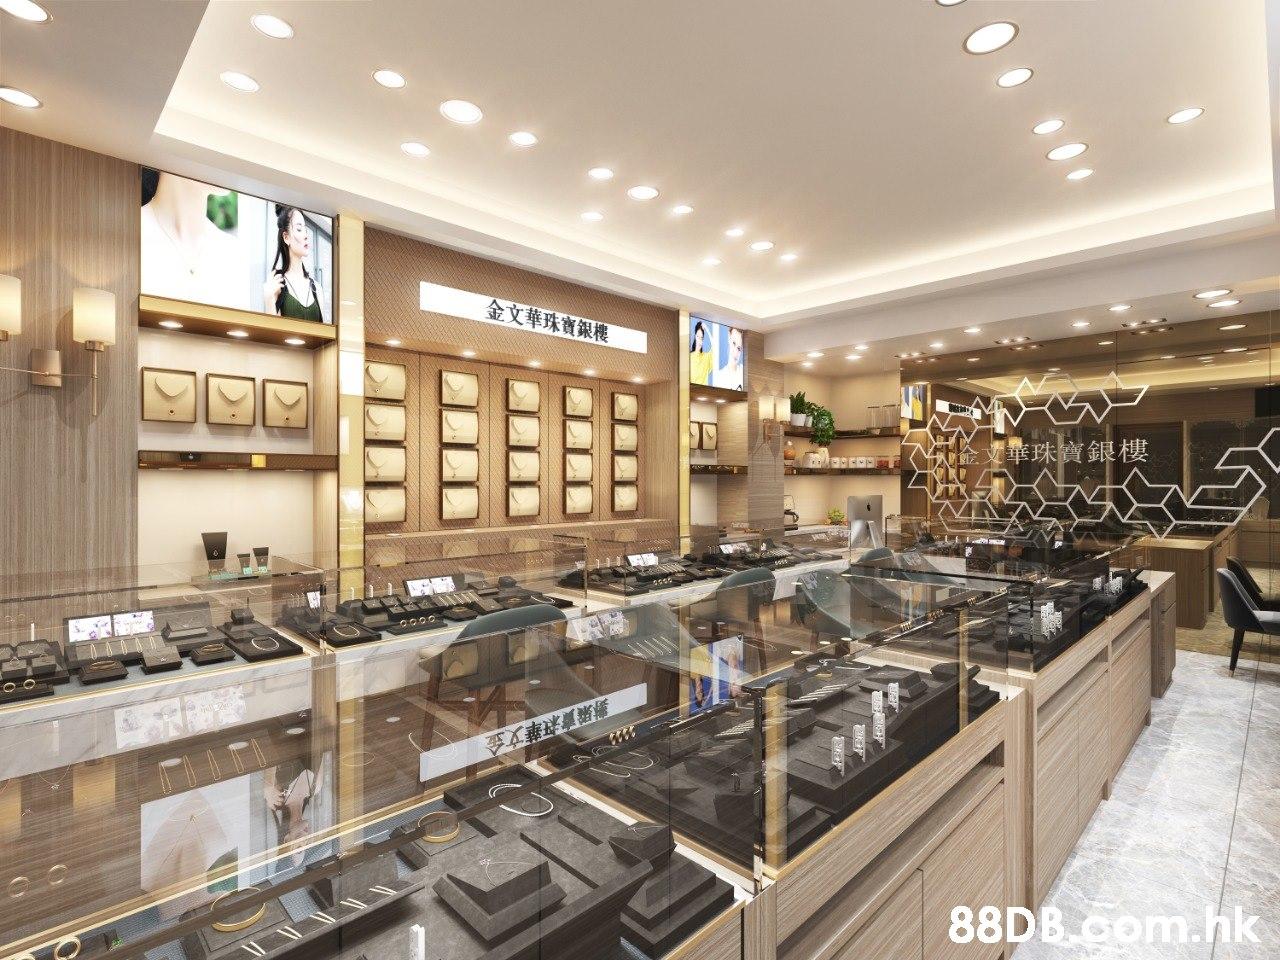 金文華珠寶銀樓 NE文華珠寶銀樓 數羅賣淑華文金 .hk  Building,Interior design,Bakery,Retail,Real estate